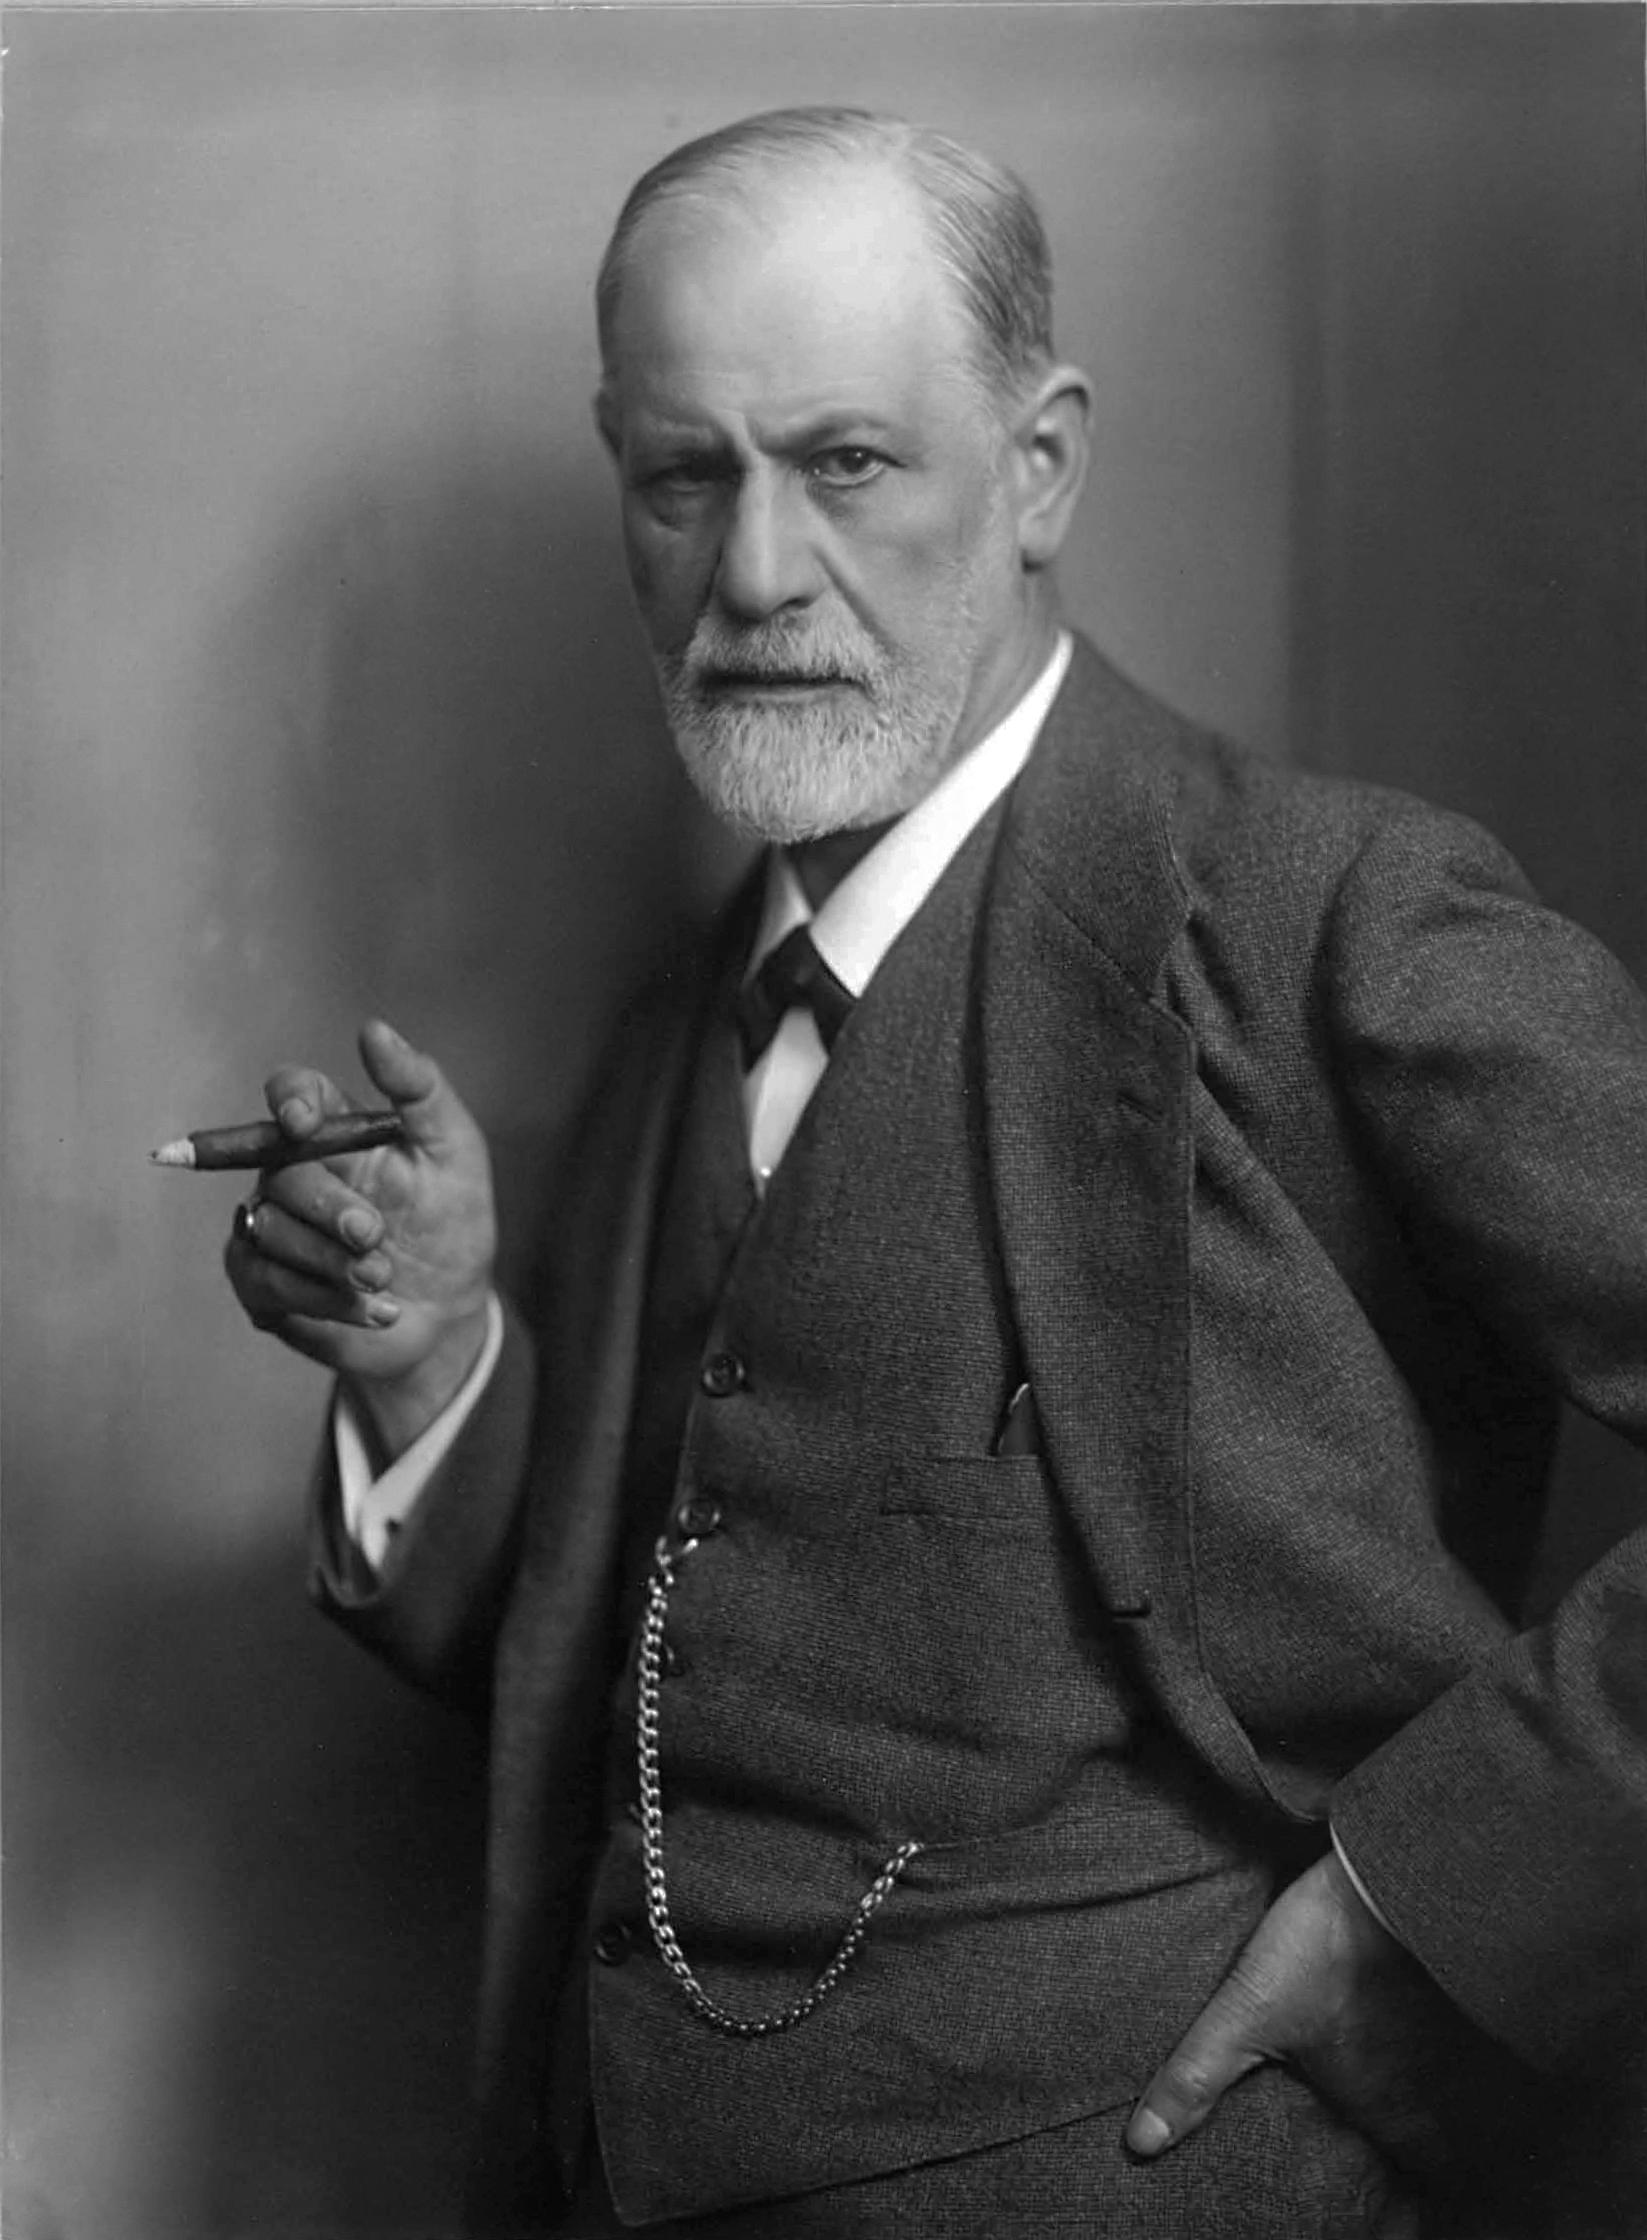 Sigmund Freud stood up smoking a cigar